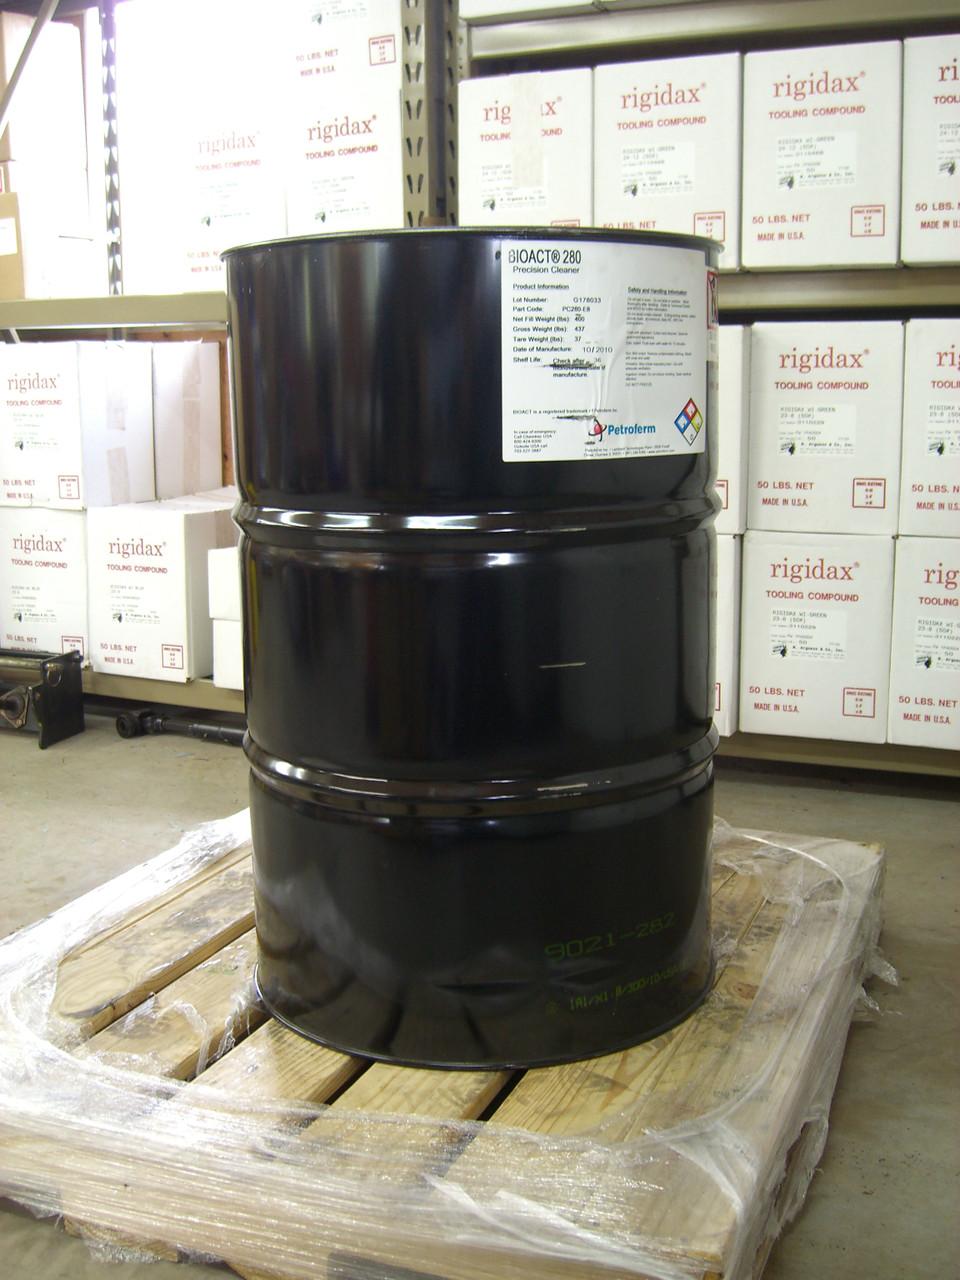 BioAct 280 Wax Remover